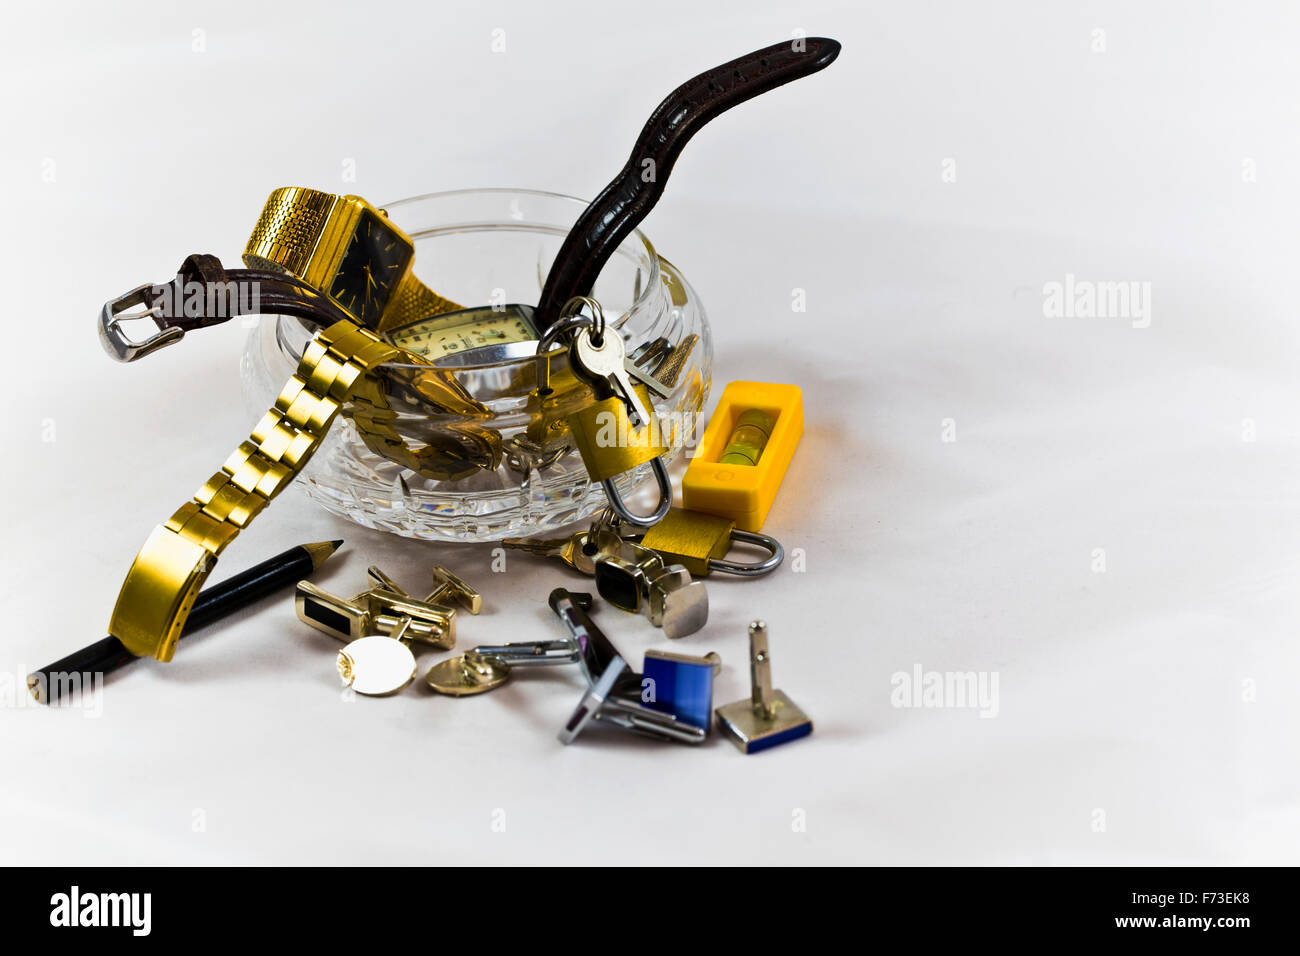 Crystal jar full of mens watches small padlocks and keys, cuff-links, small spirit level - Stock Image